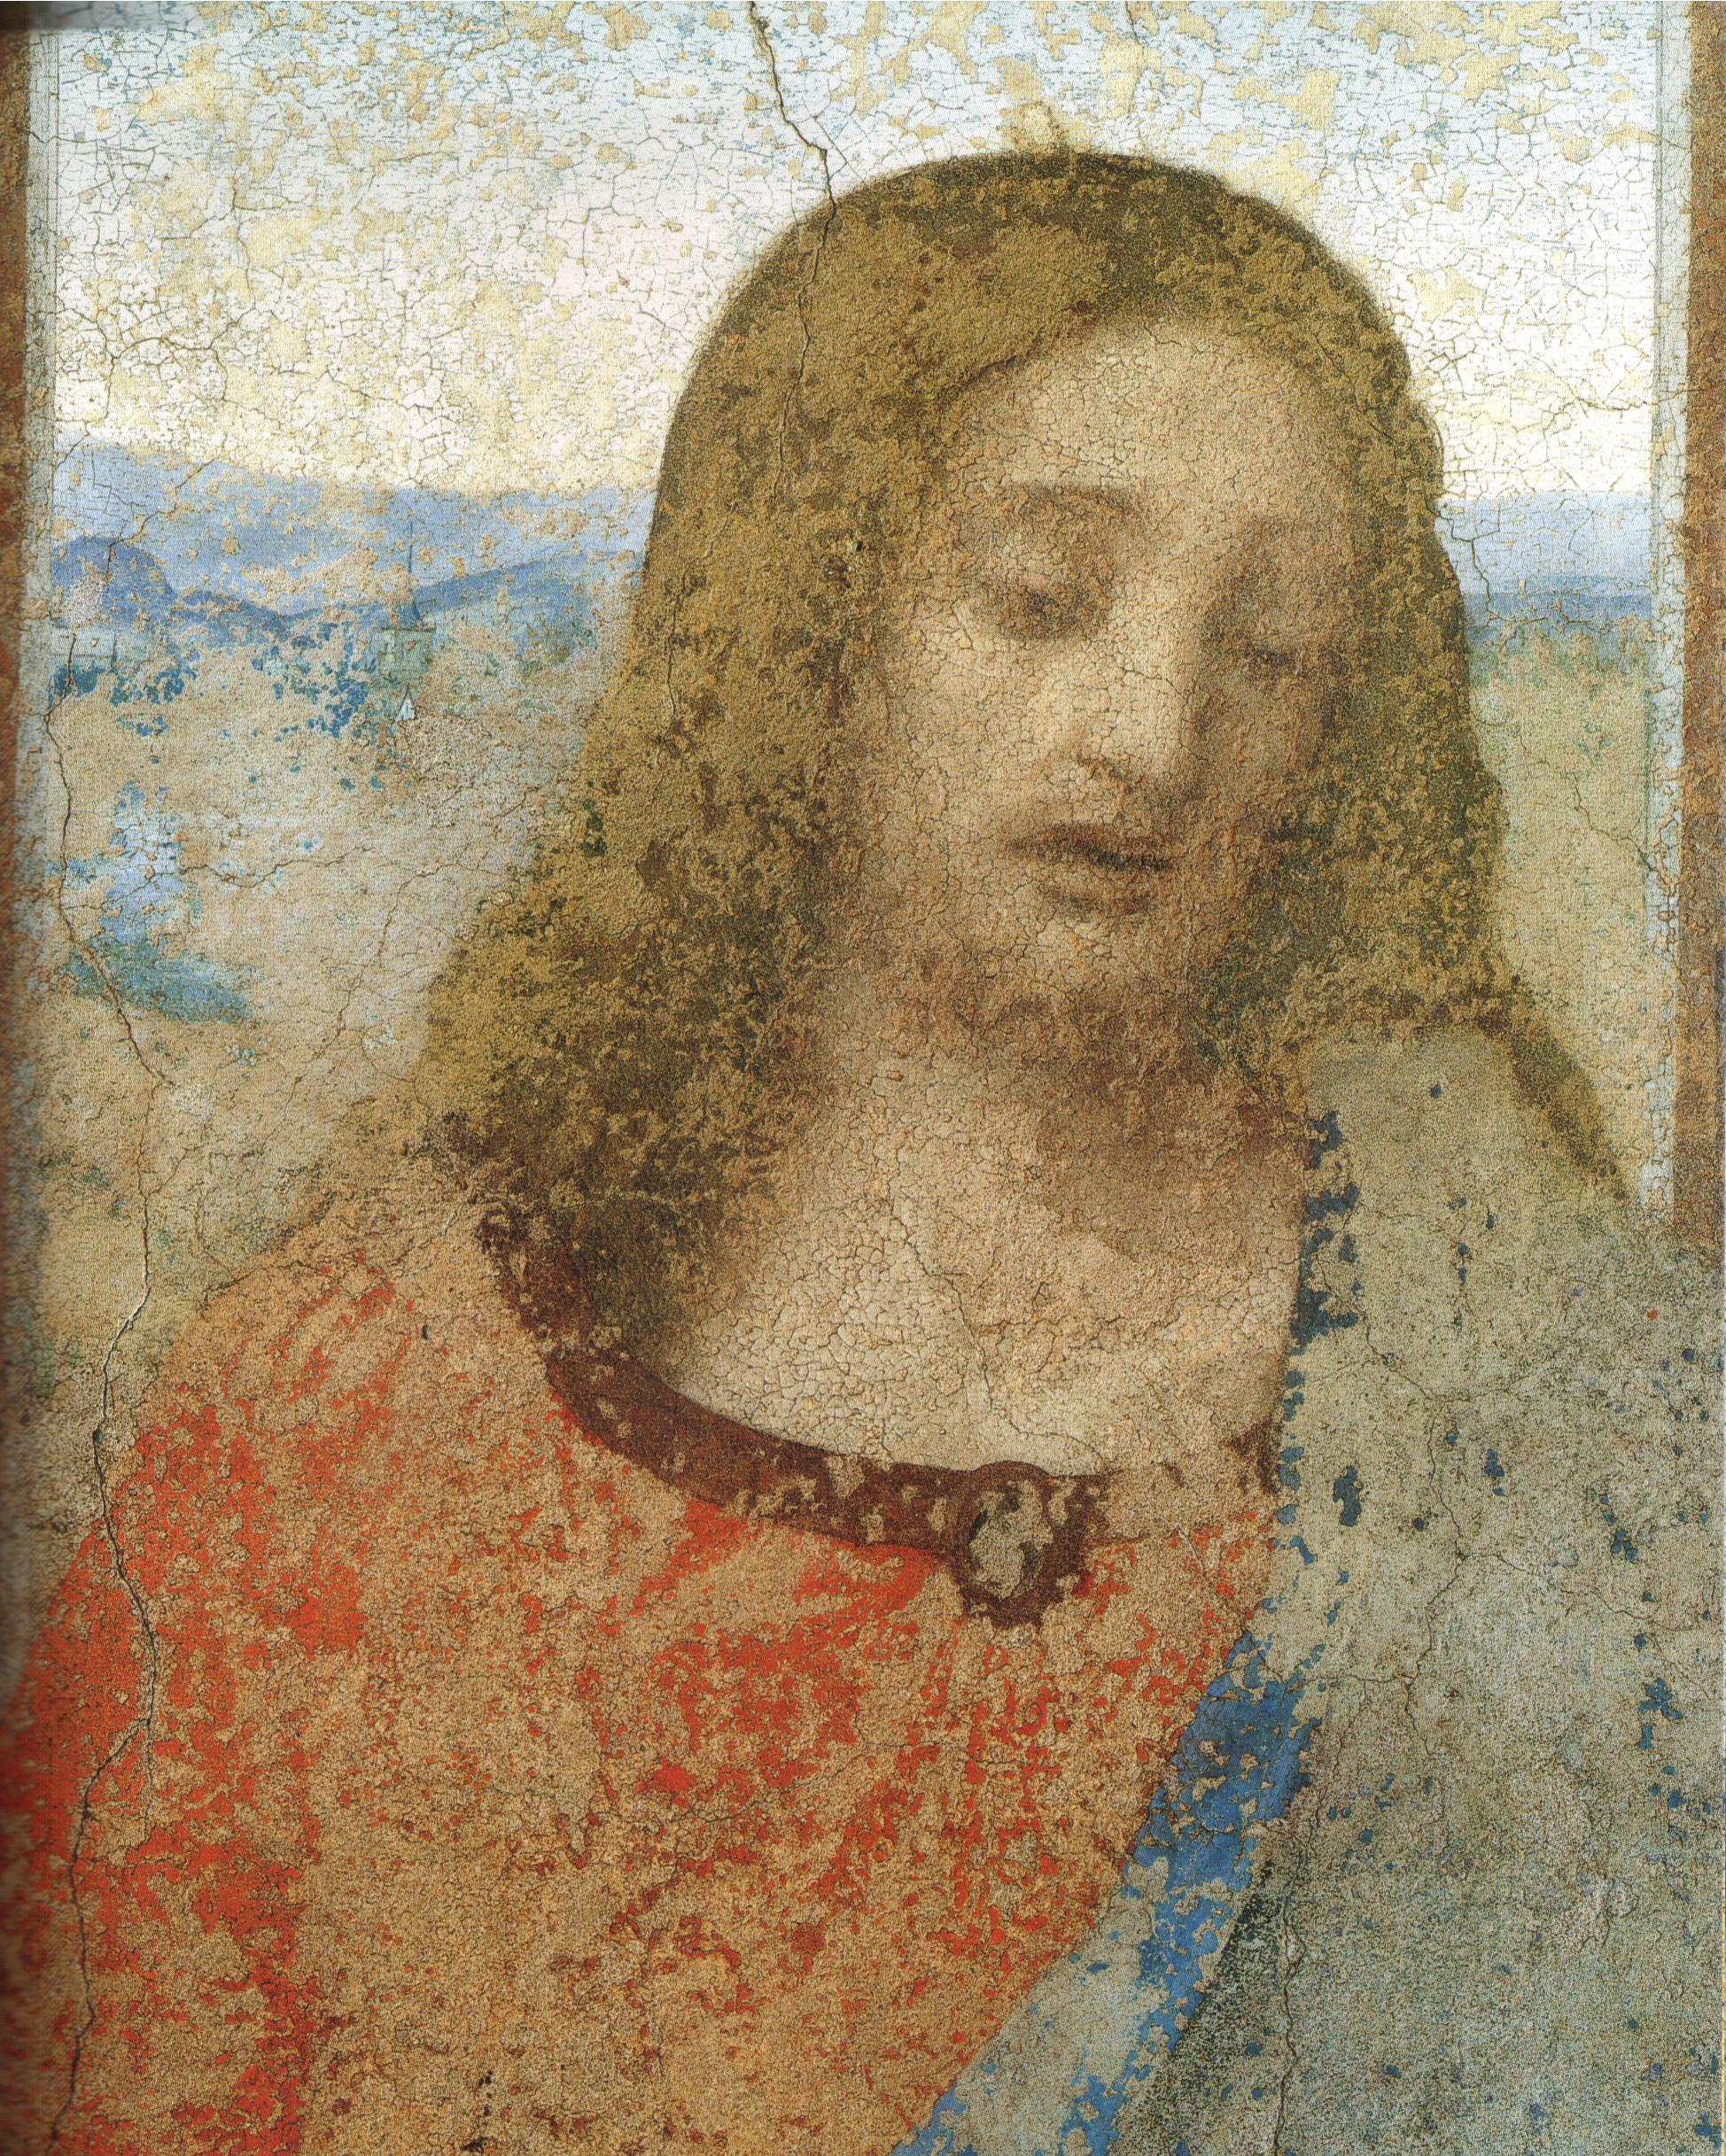 Leonardo Da Vinci Salvator Mundi Wikipedia >> File:Leonardo, ultima cena (restored) 02.jpg - Wikimedia Commons